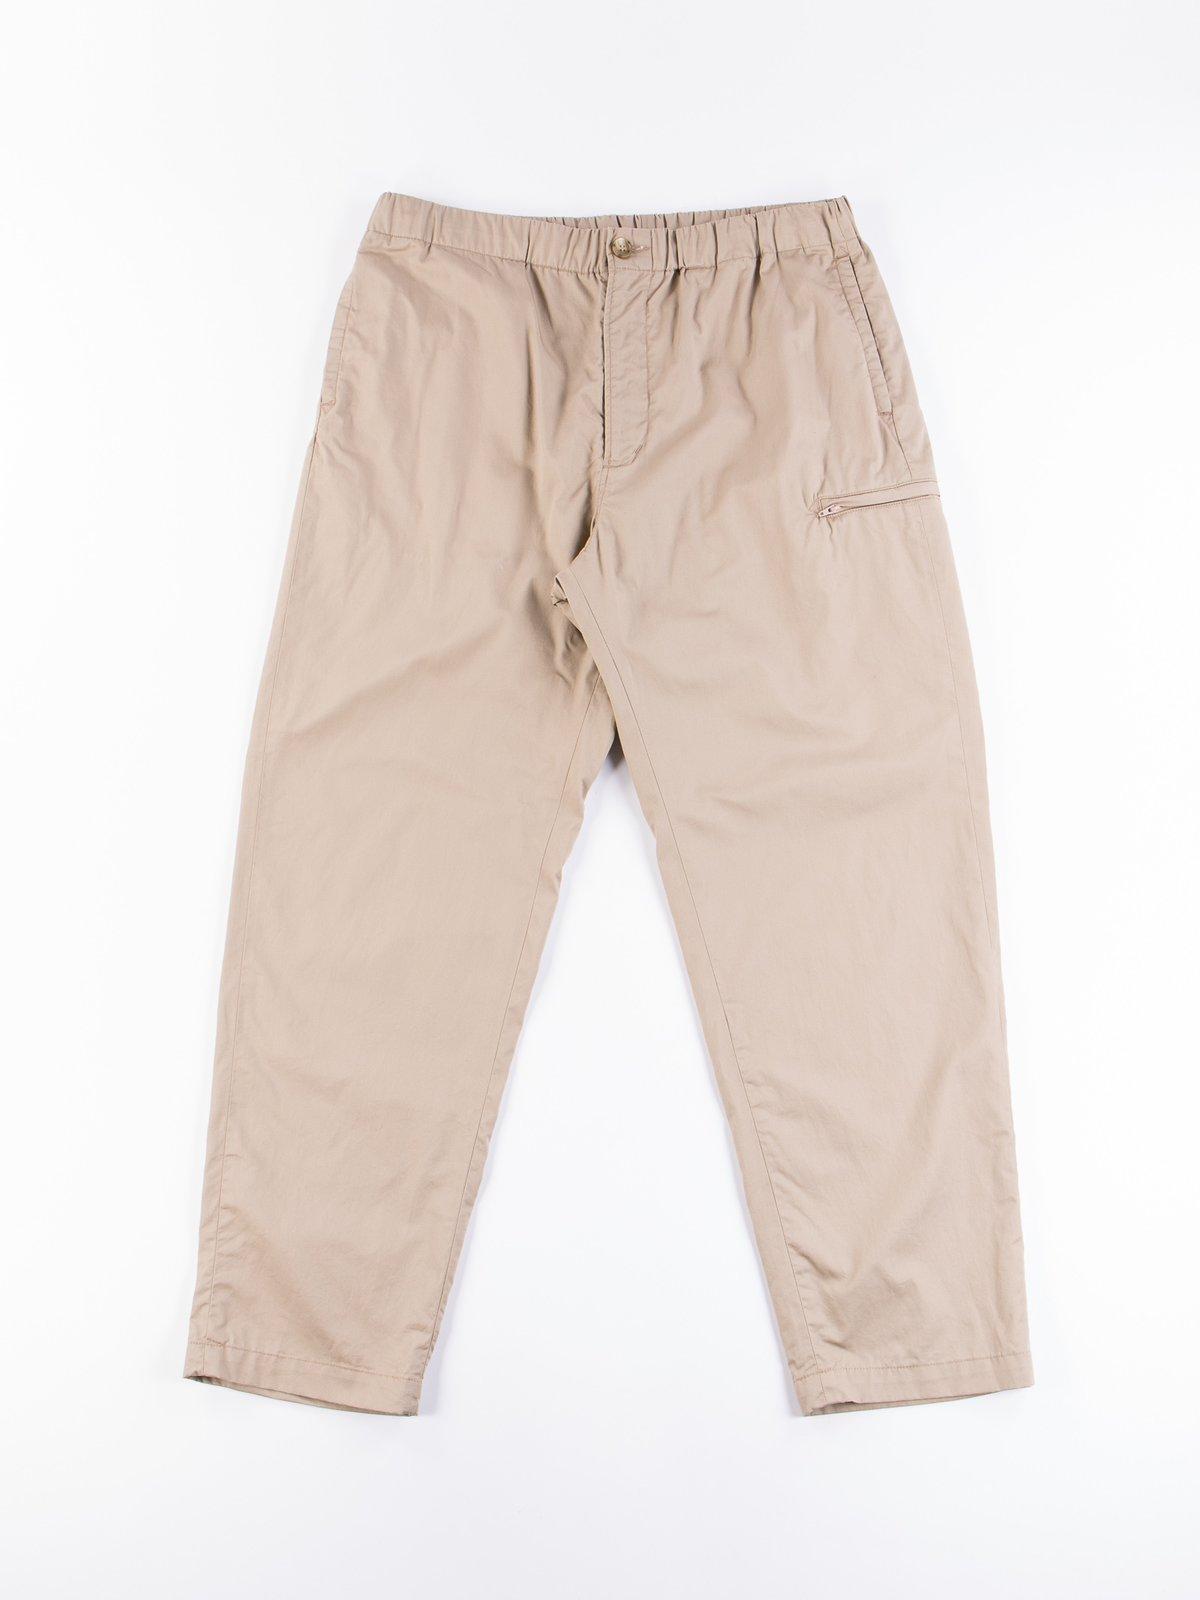 Khaki Highcount Twill Drawstring Pant - Image 1